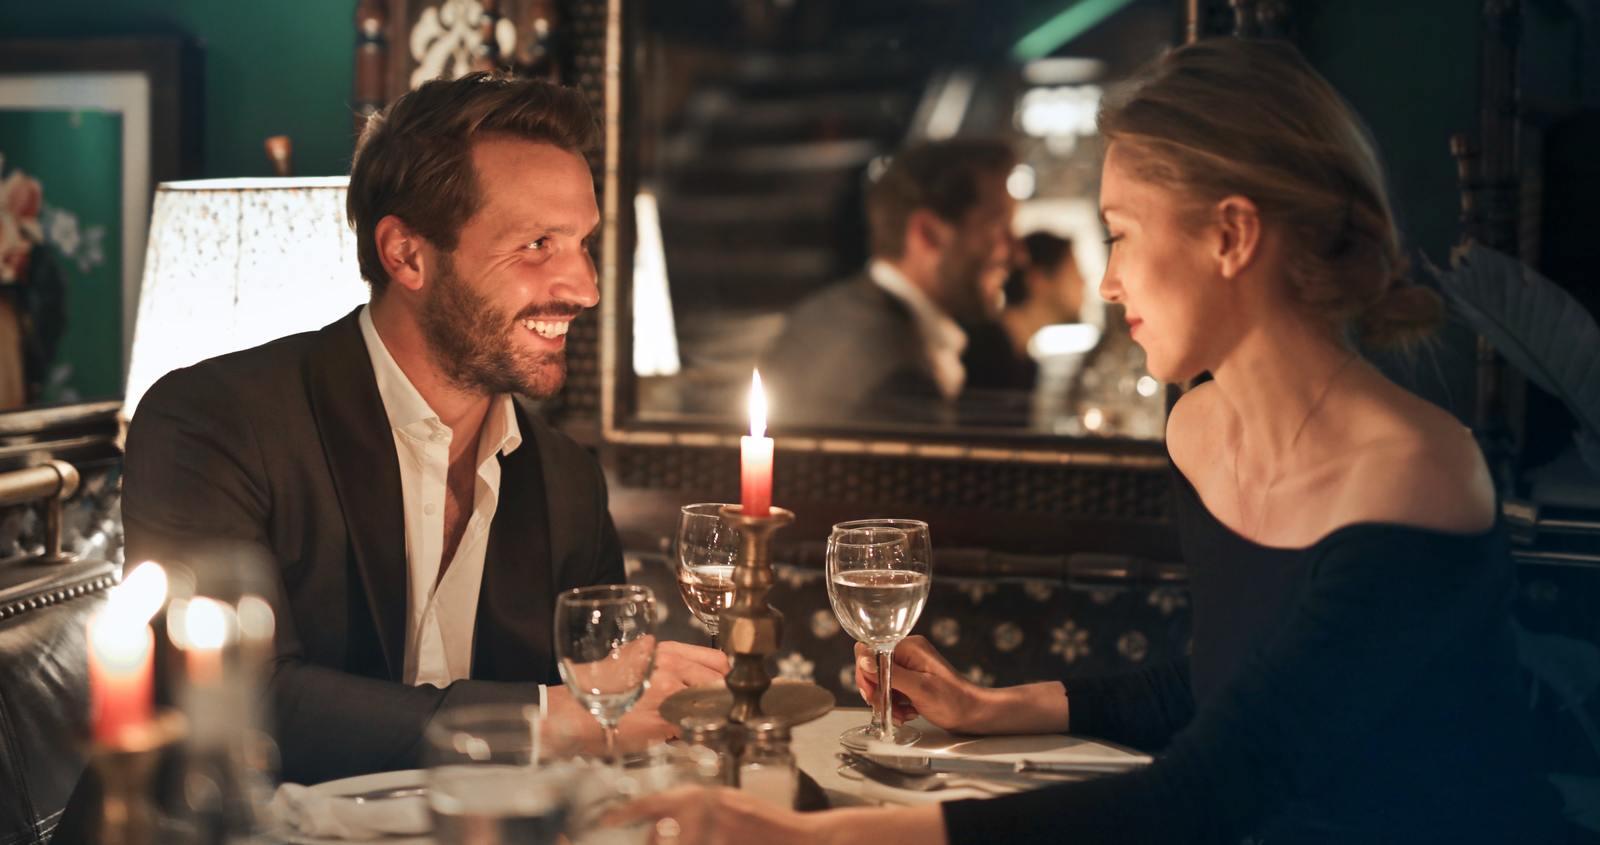 Things to Consider When Choosing a Romantic Restaurant – Greenvale Farm